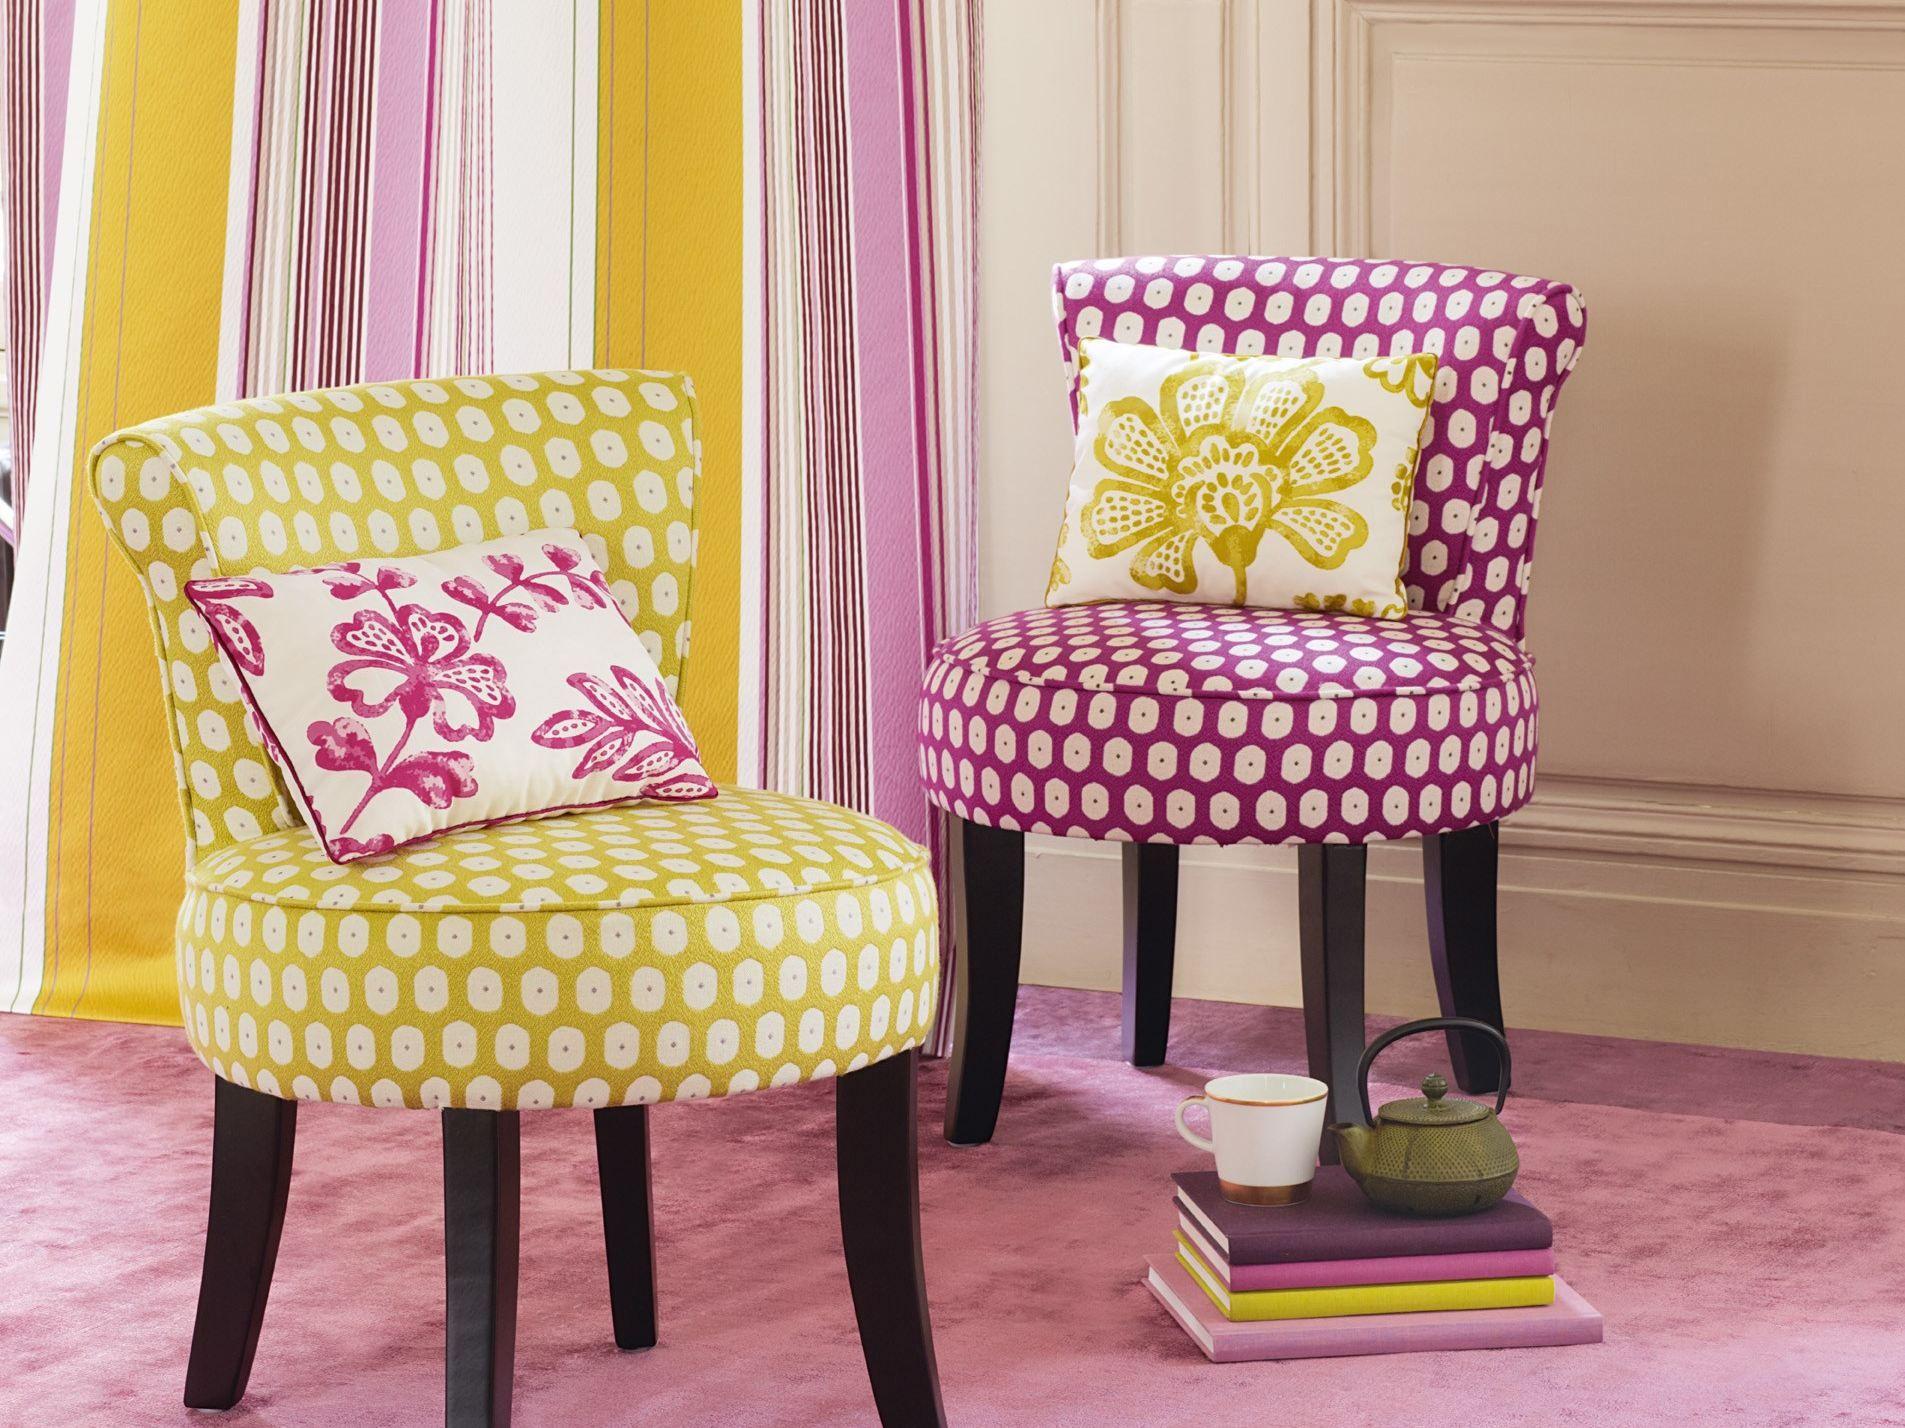 Tejido de lunares de tapicer a jacquard de algod n for Ameublement design